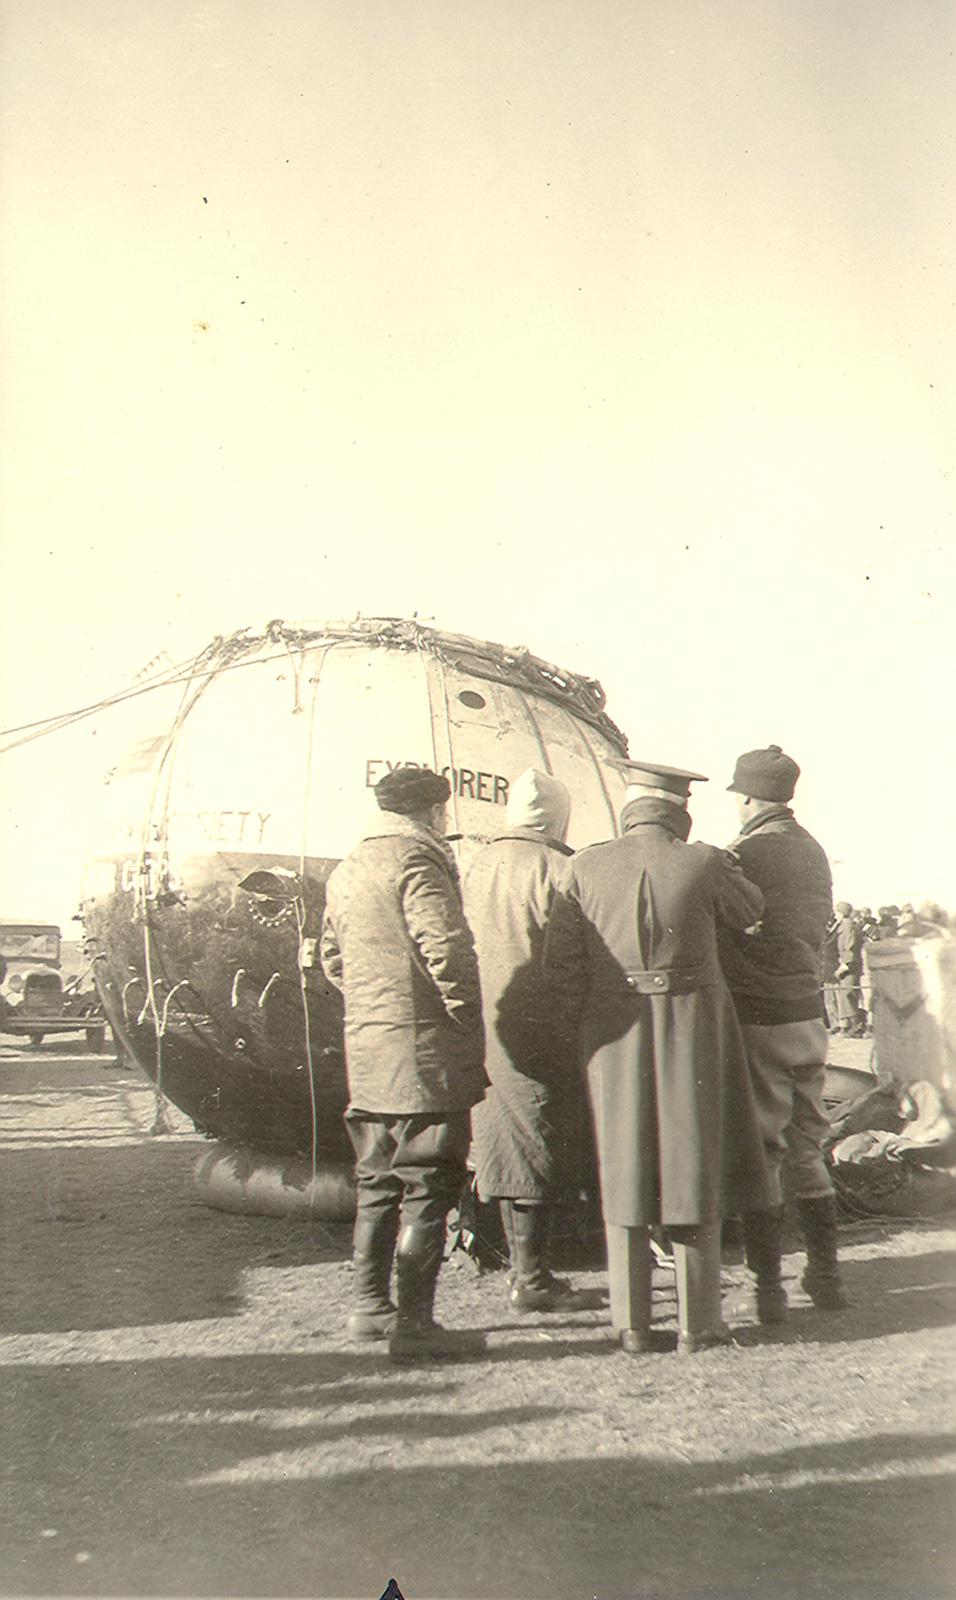 Historic Weather Balloon Explorer II, Lake Andes NWR, South Dakota